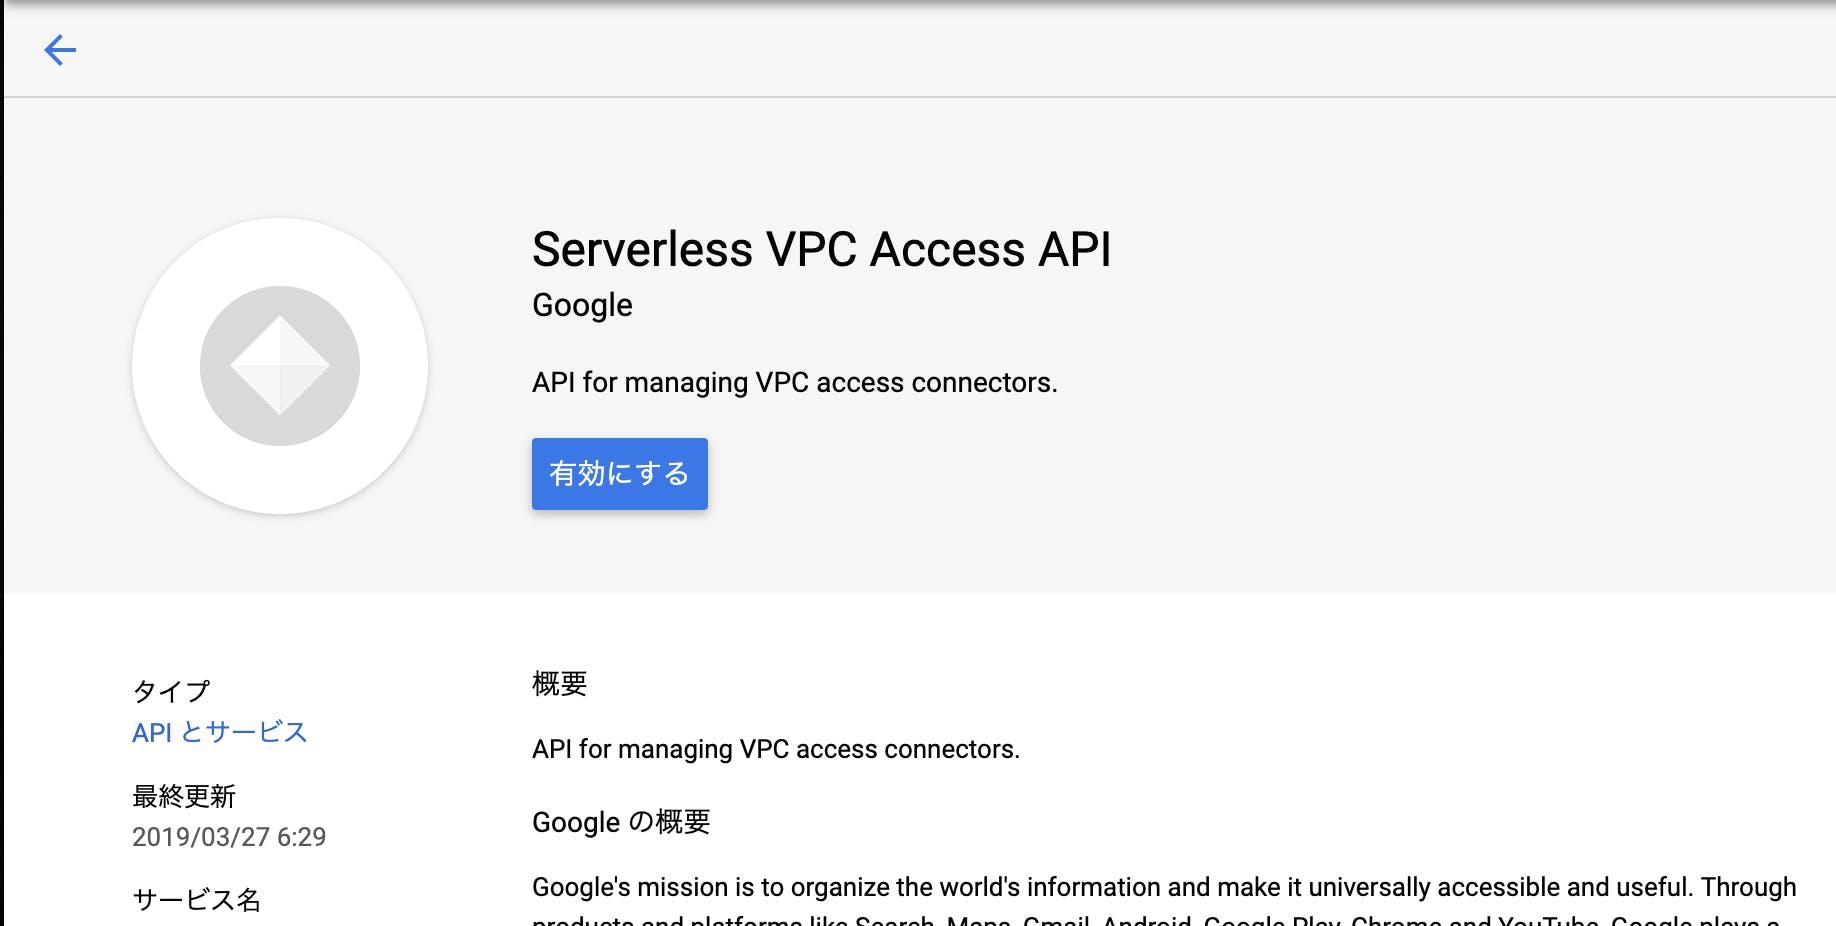 Serverless VPC accessを使って、マネージドサービスからVPC内へアクセス